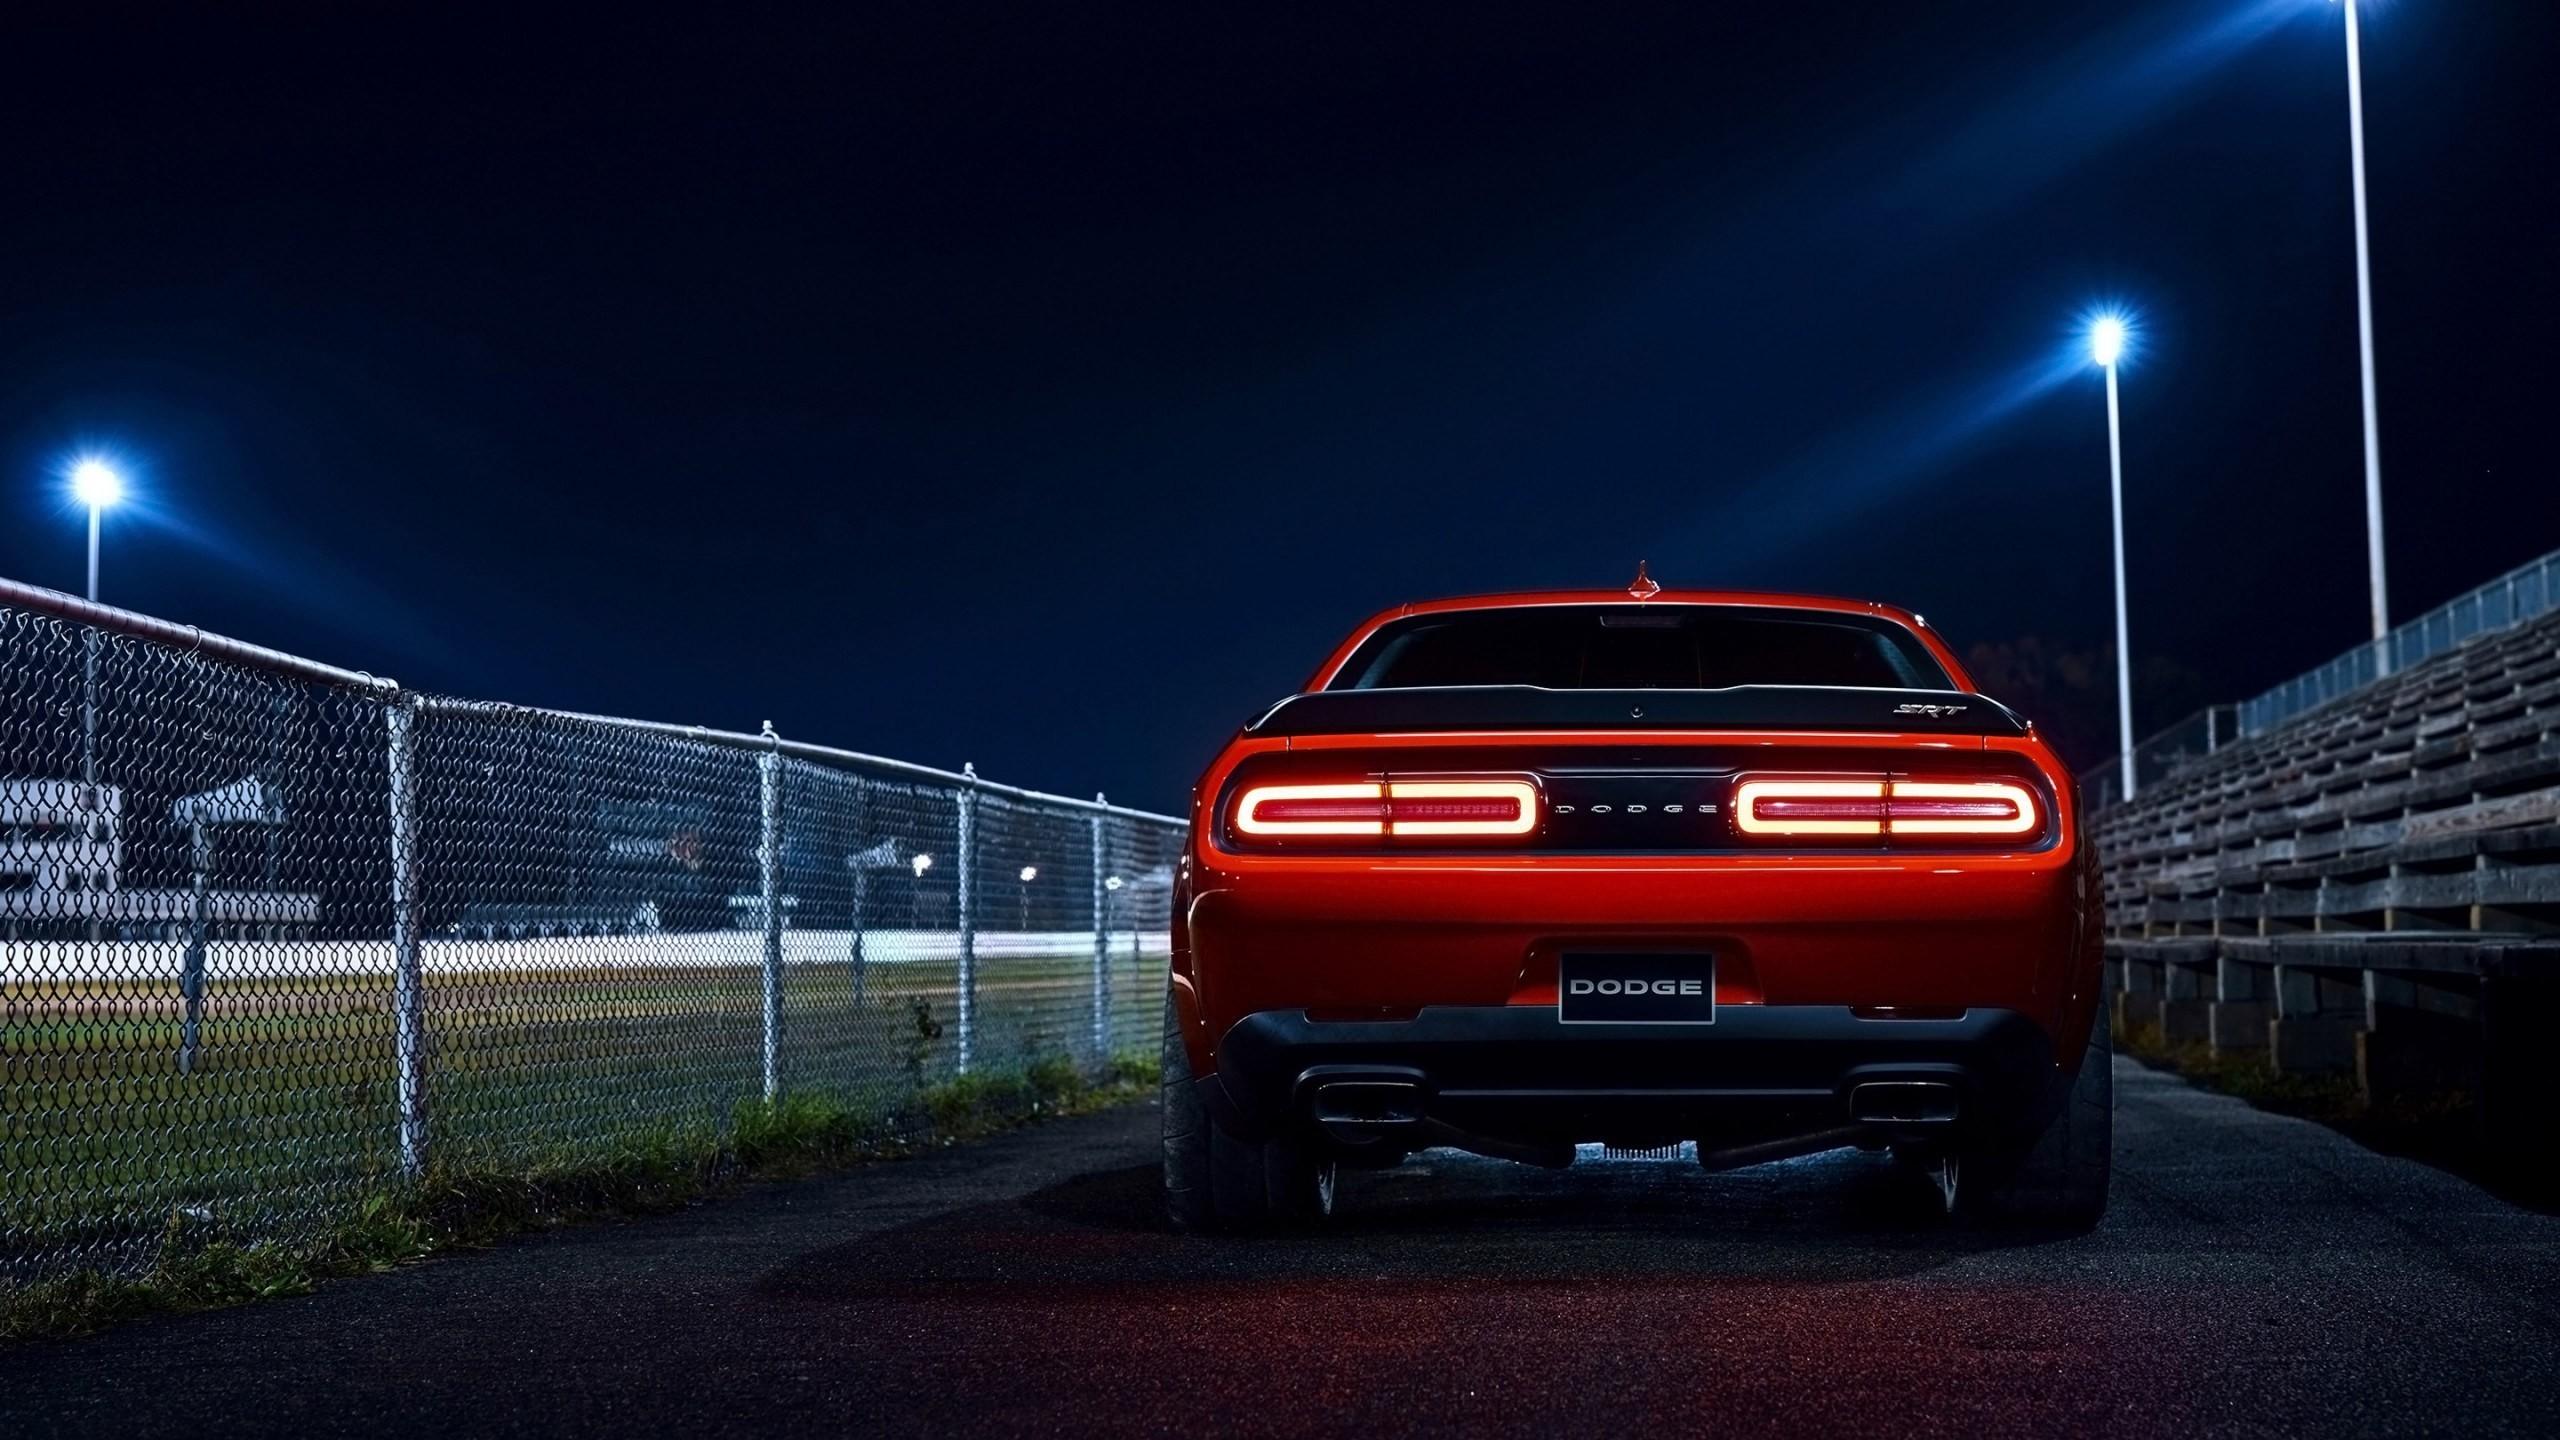 Dodge Challenger iPhone Wallpaper 86+ images